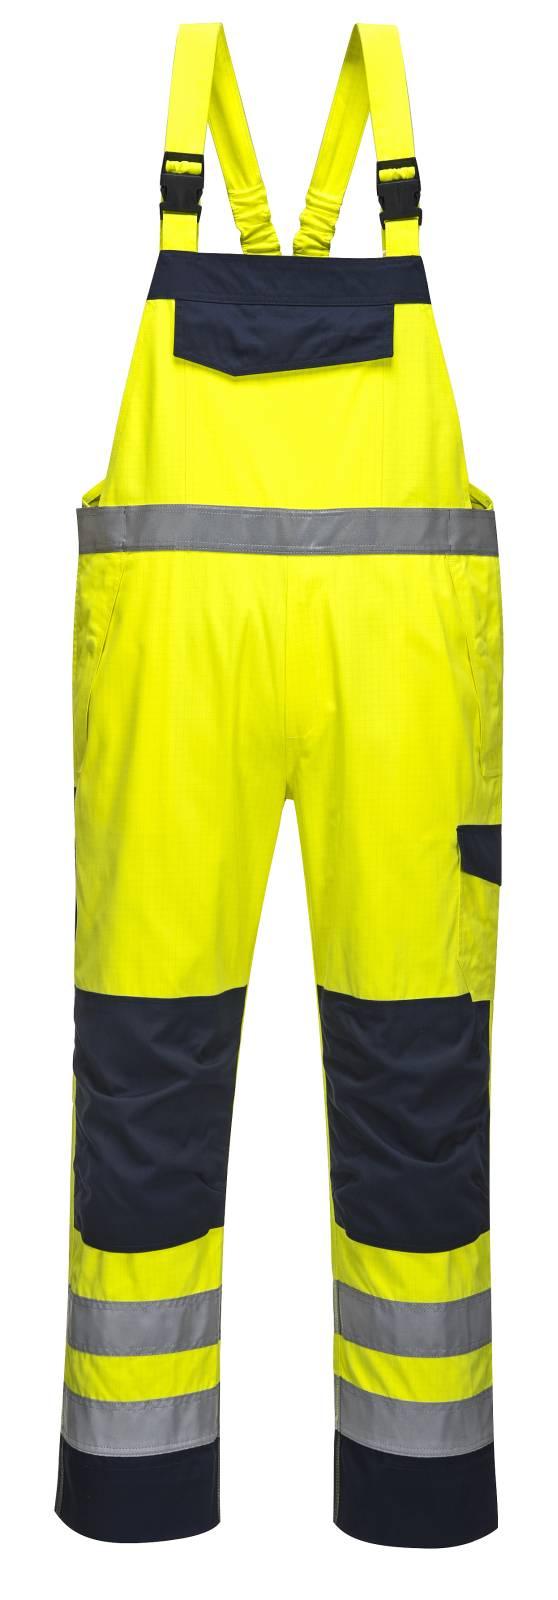 Portwest Amerikaanse overalls MV27 geel-marineblauw(YN)